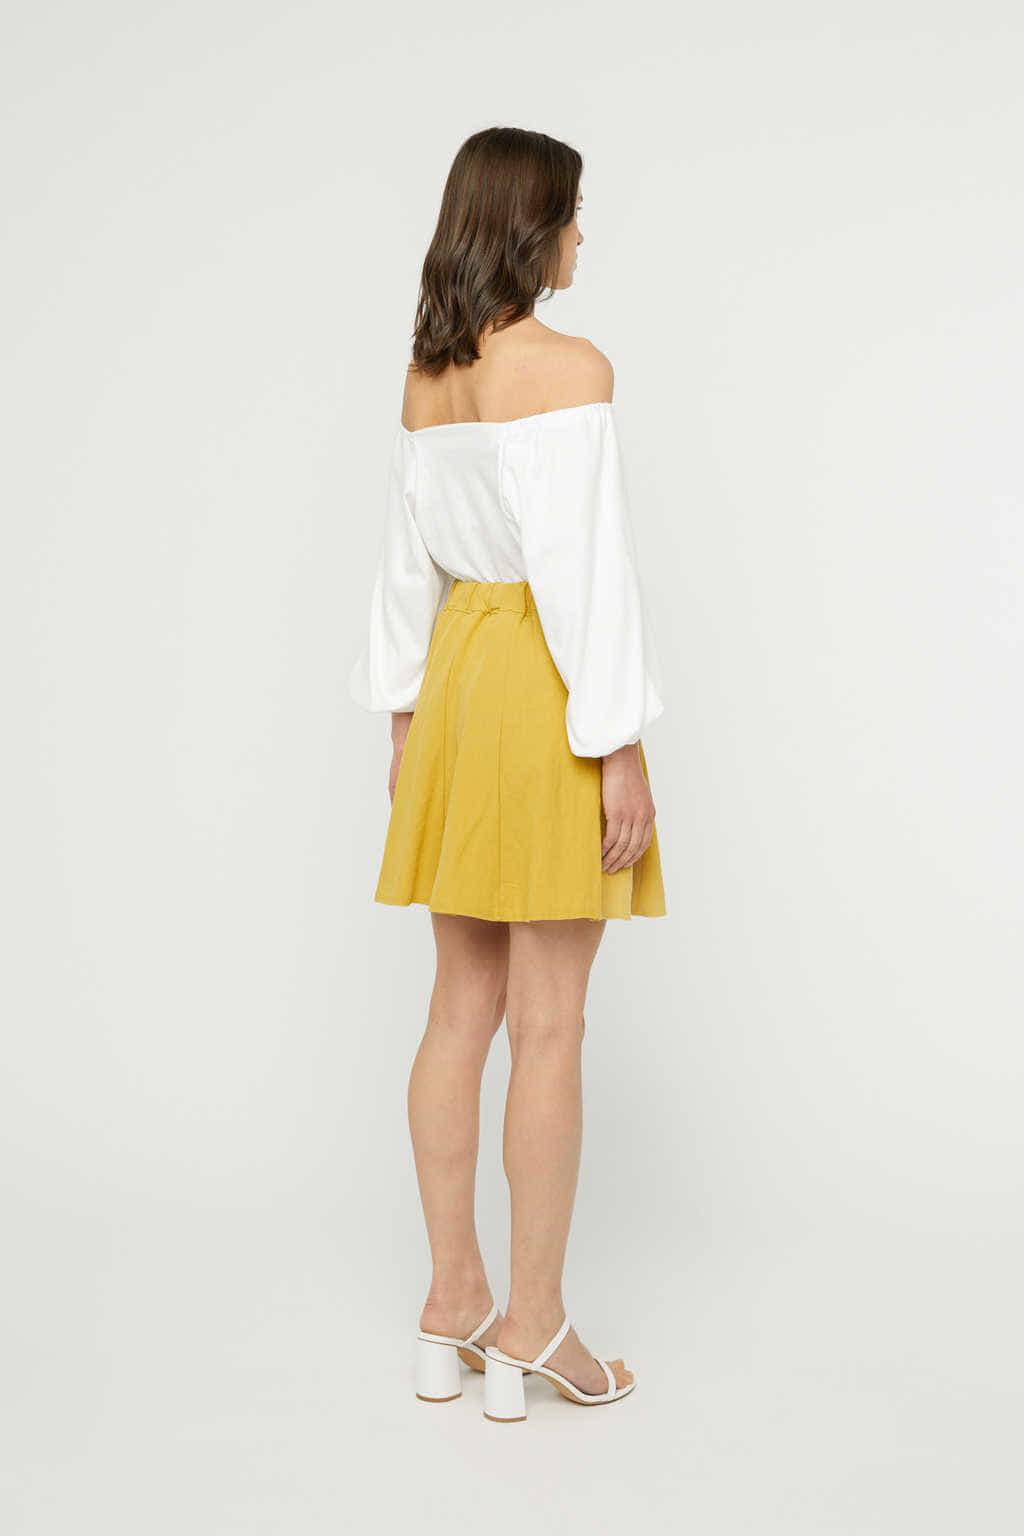 Skirt K022 Mustard 4